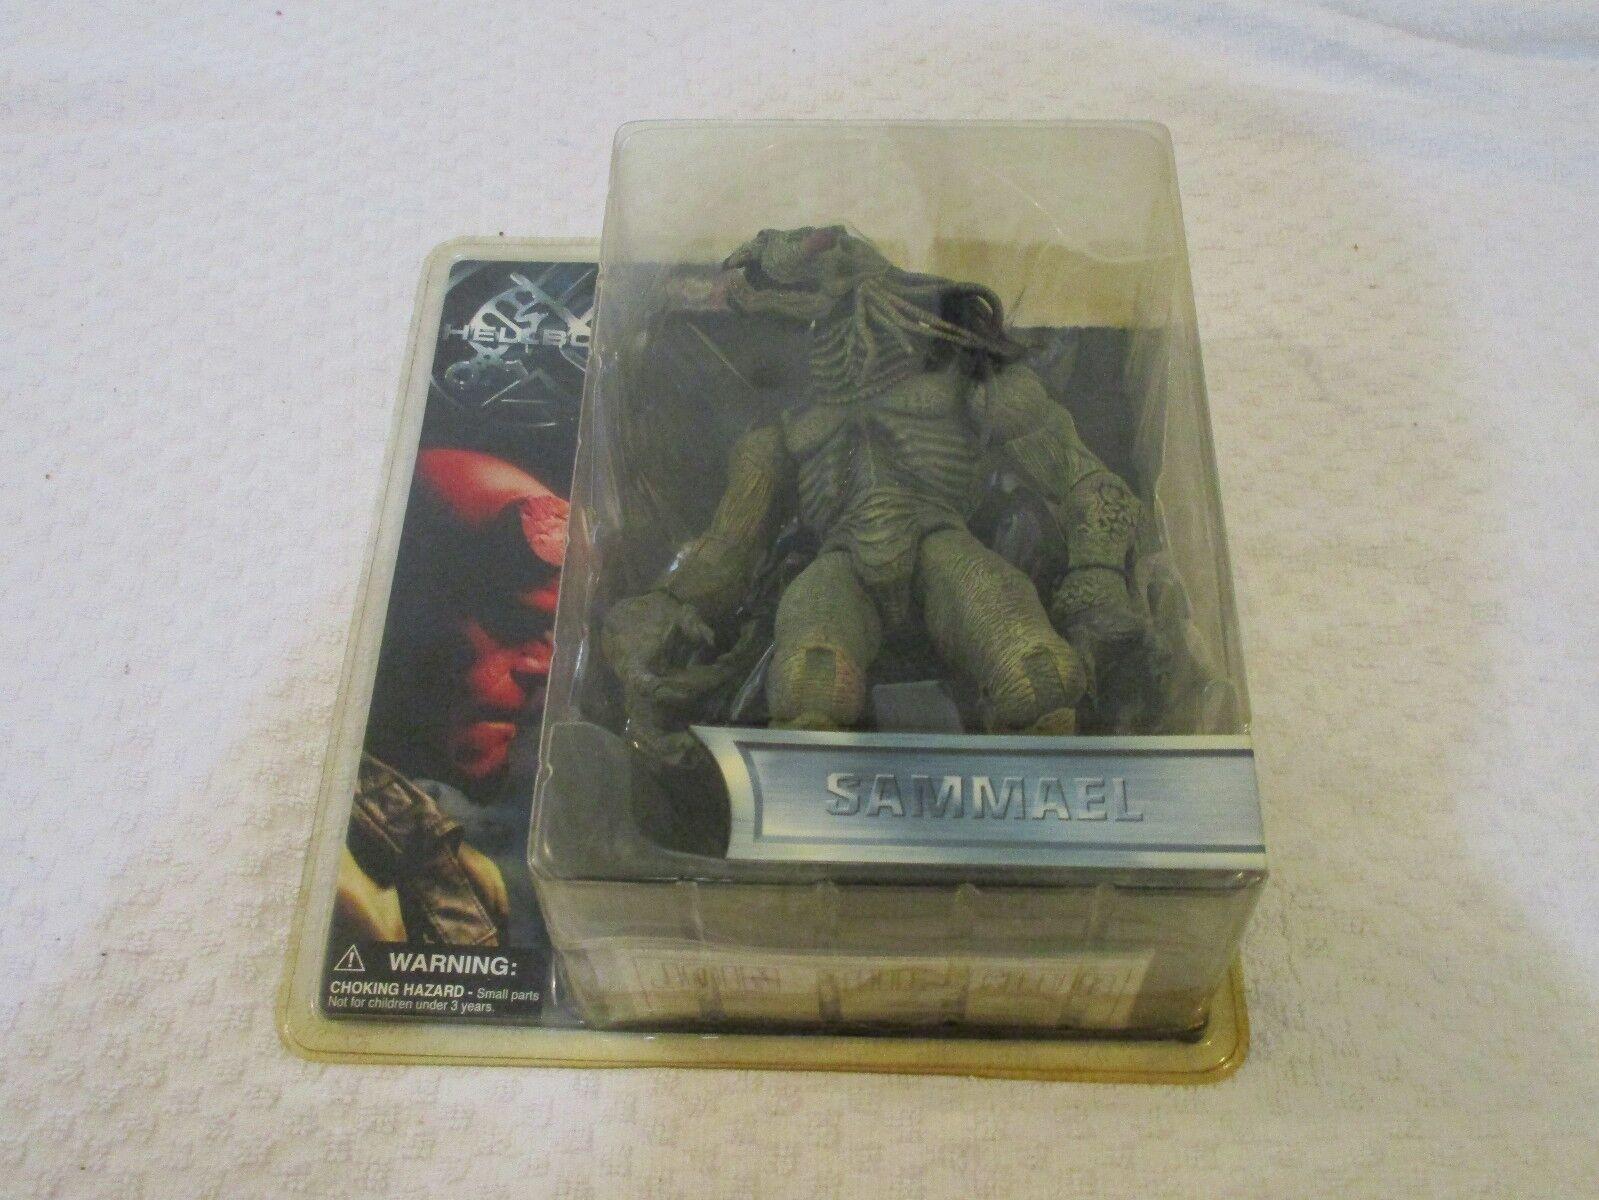 Mezco Hellboy Sammael 8